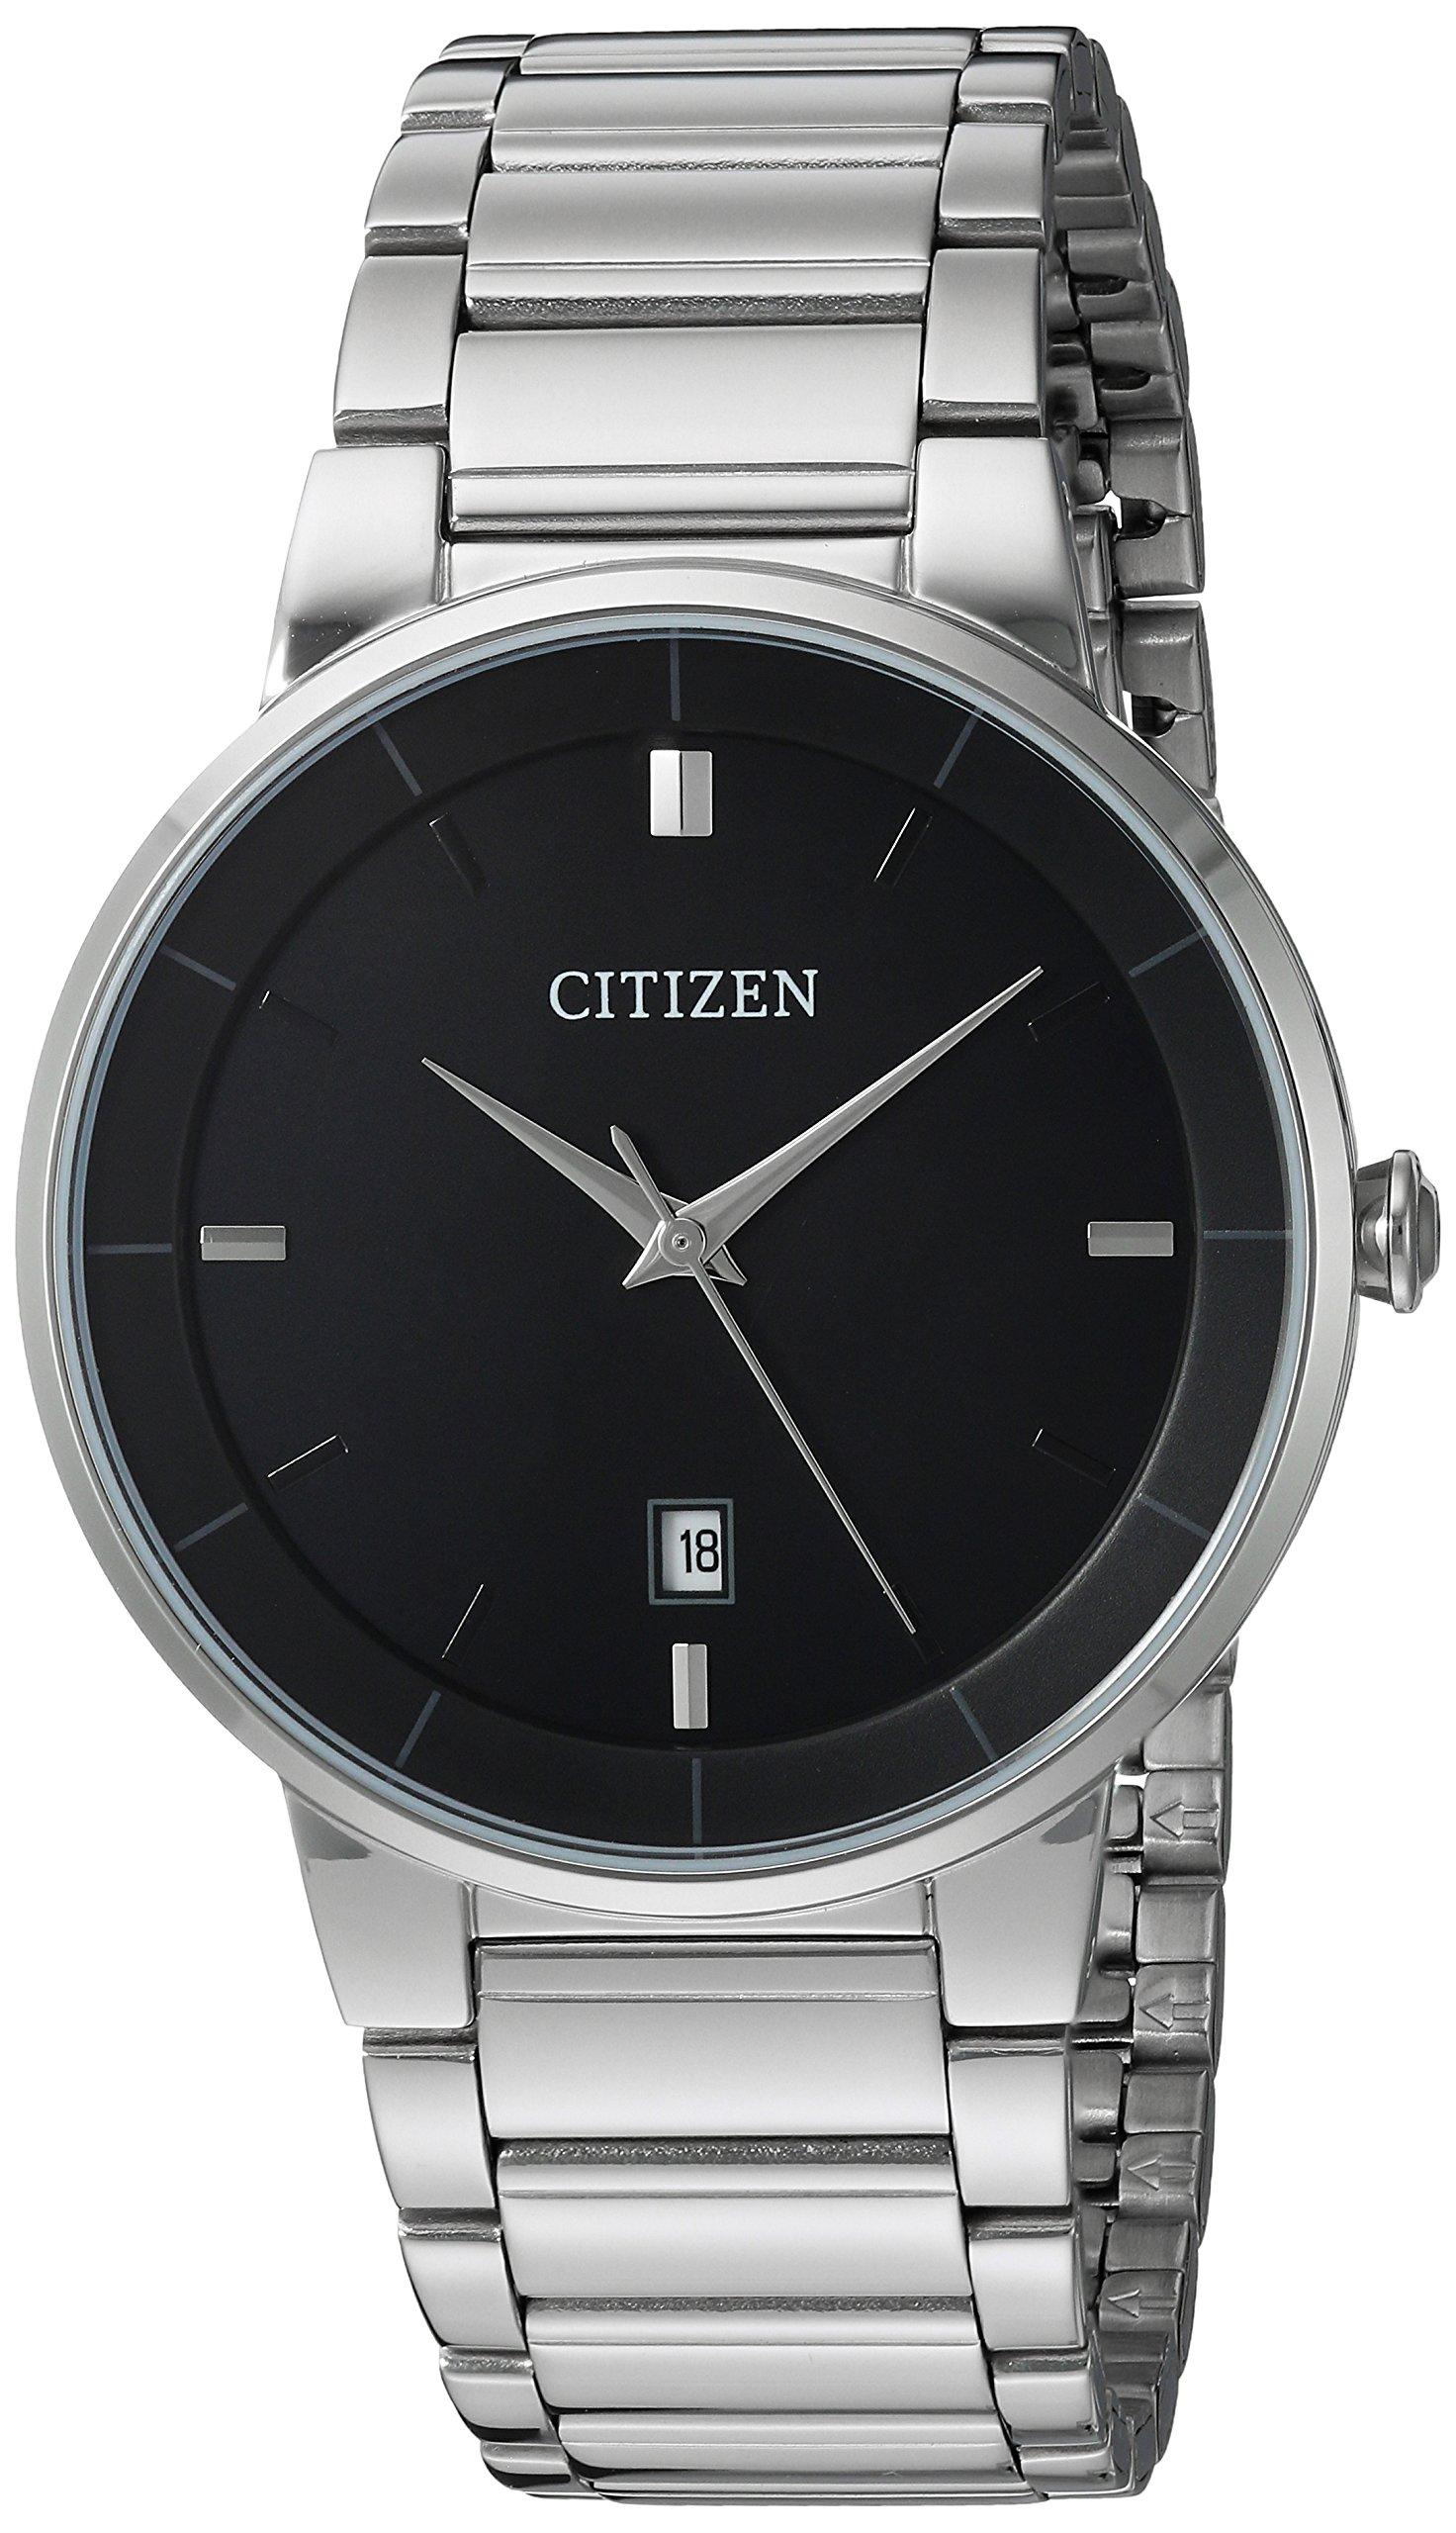 Citizen Quartz Stainless Steel BI5010 59E